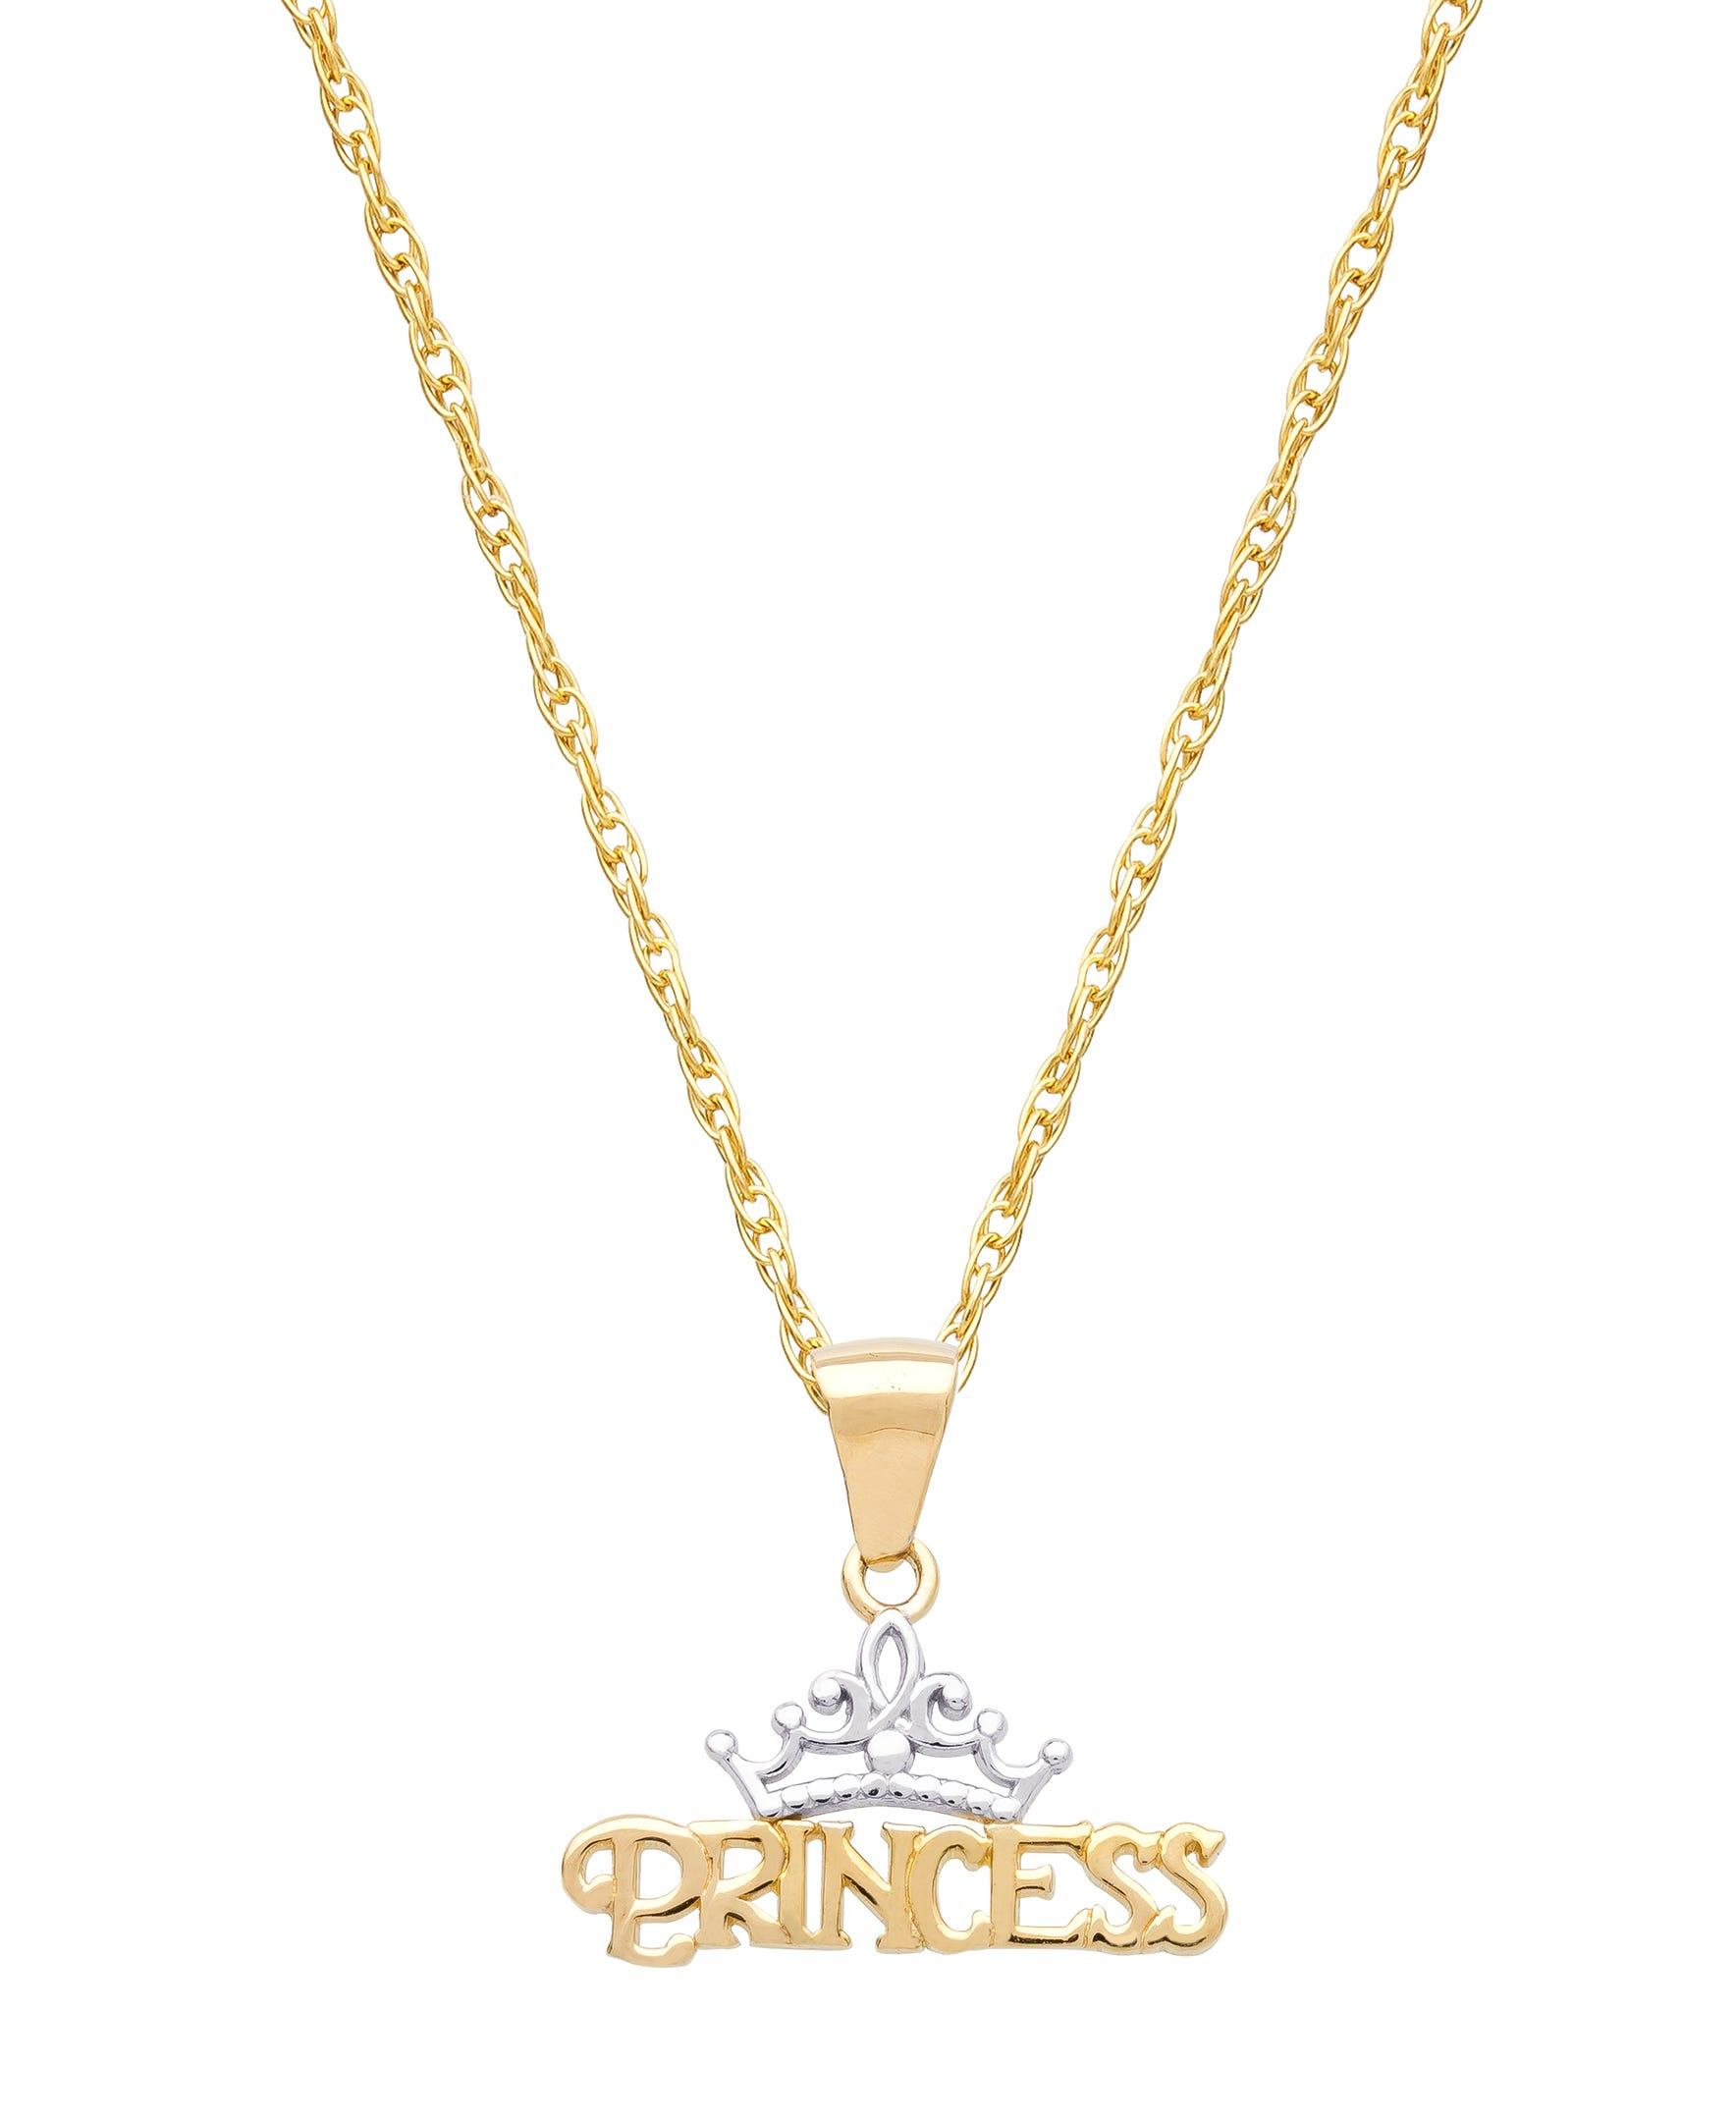 DISNEY© Princess Pendant in 10k Yellow Gold